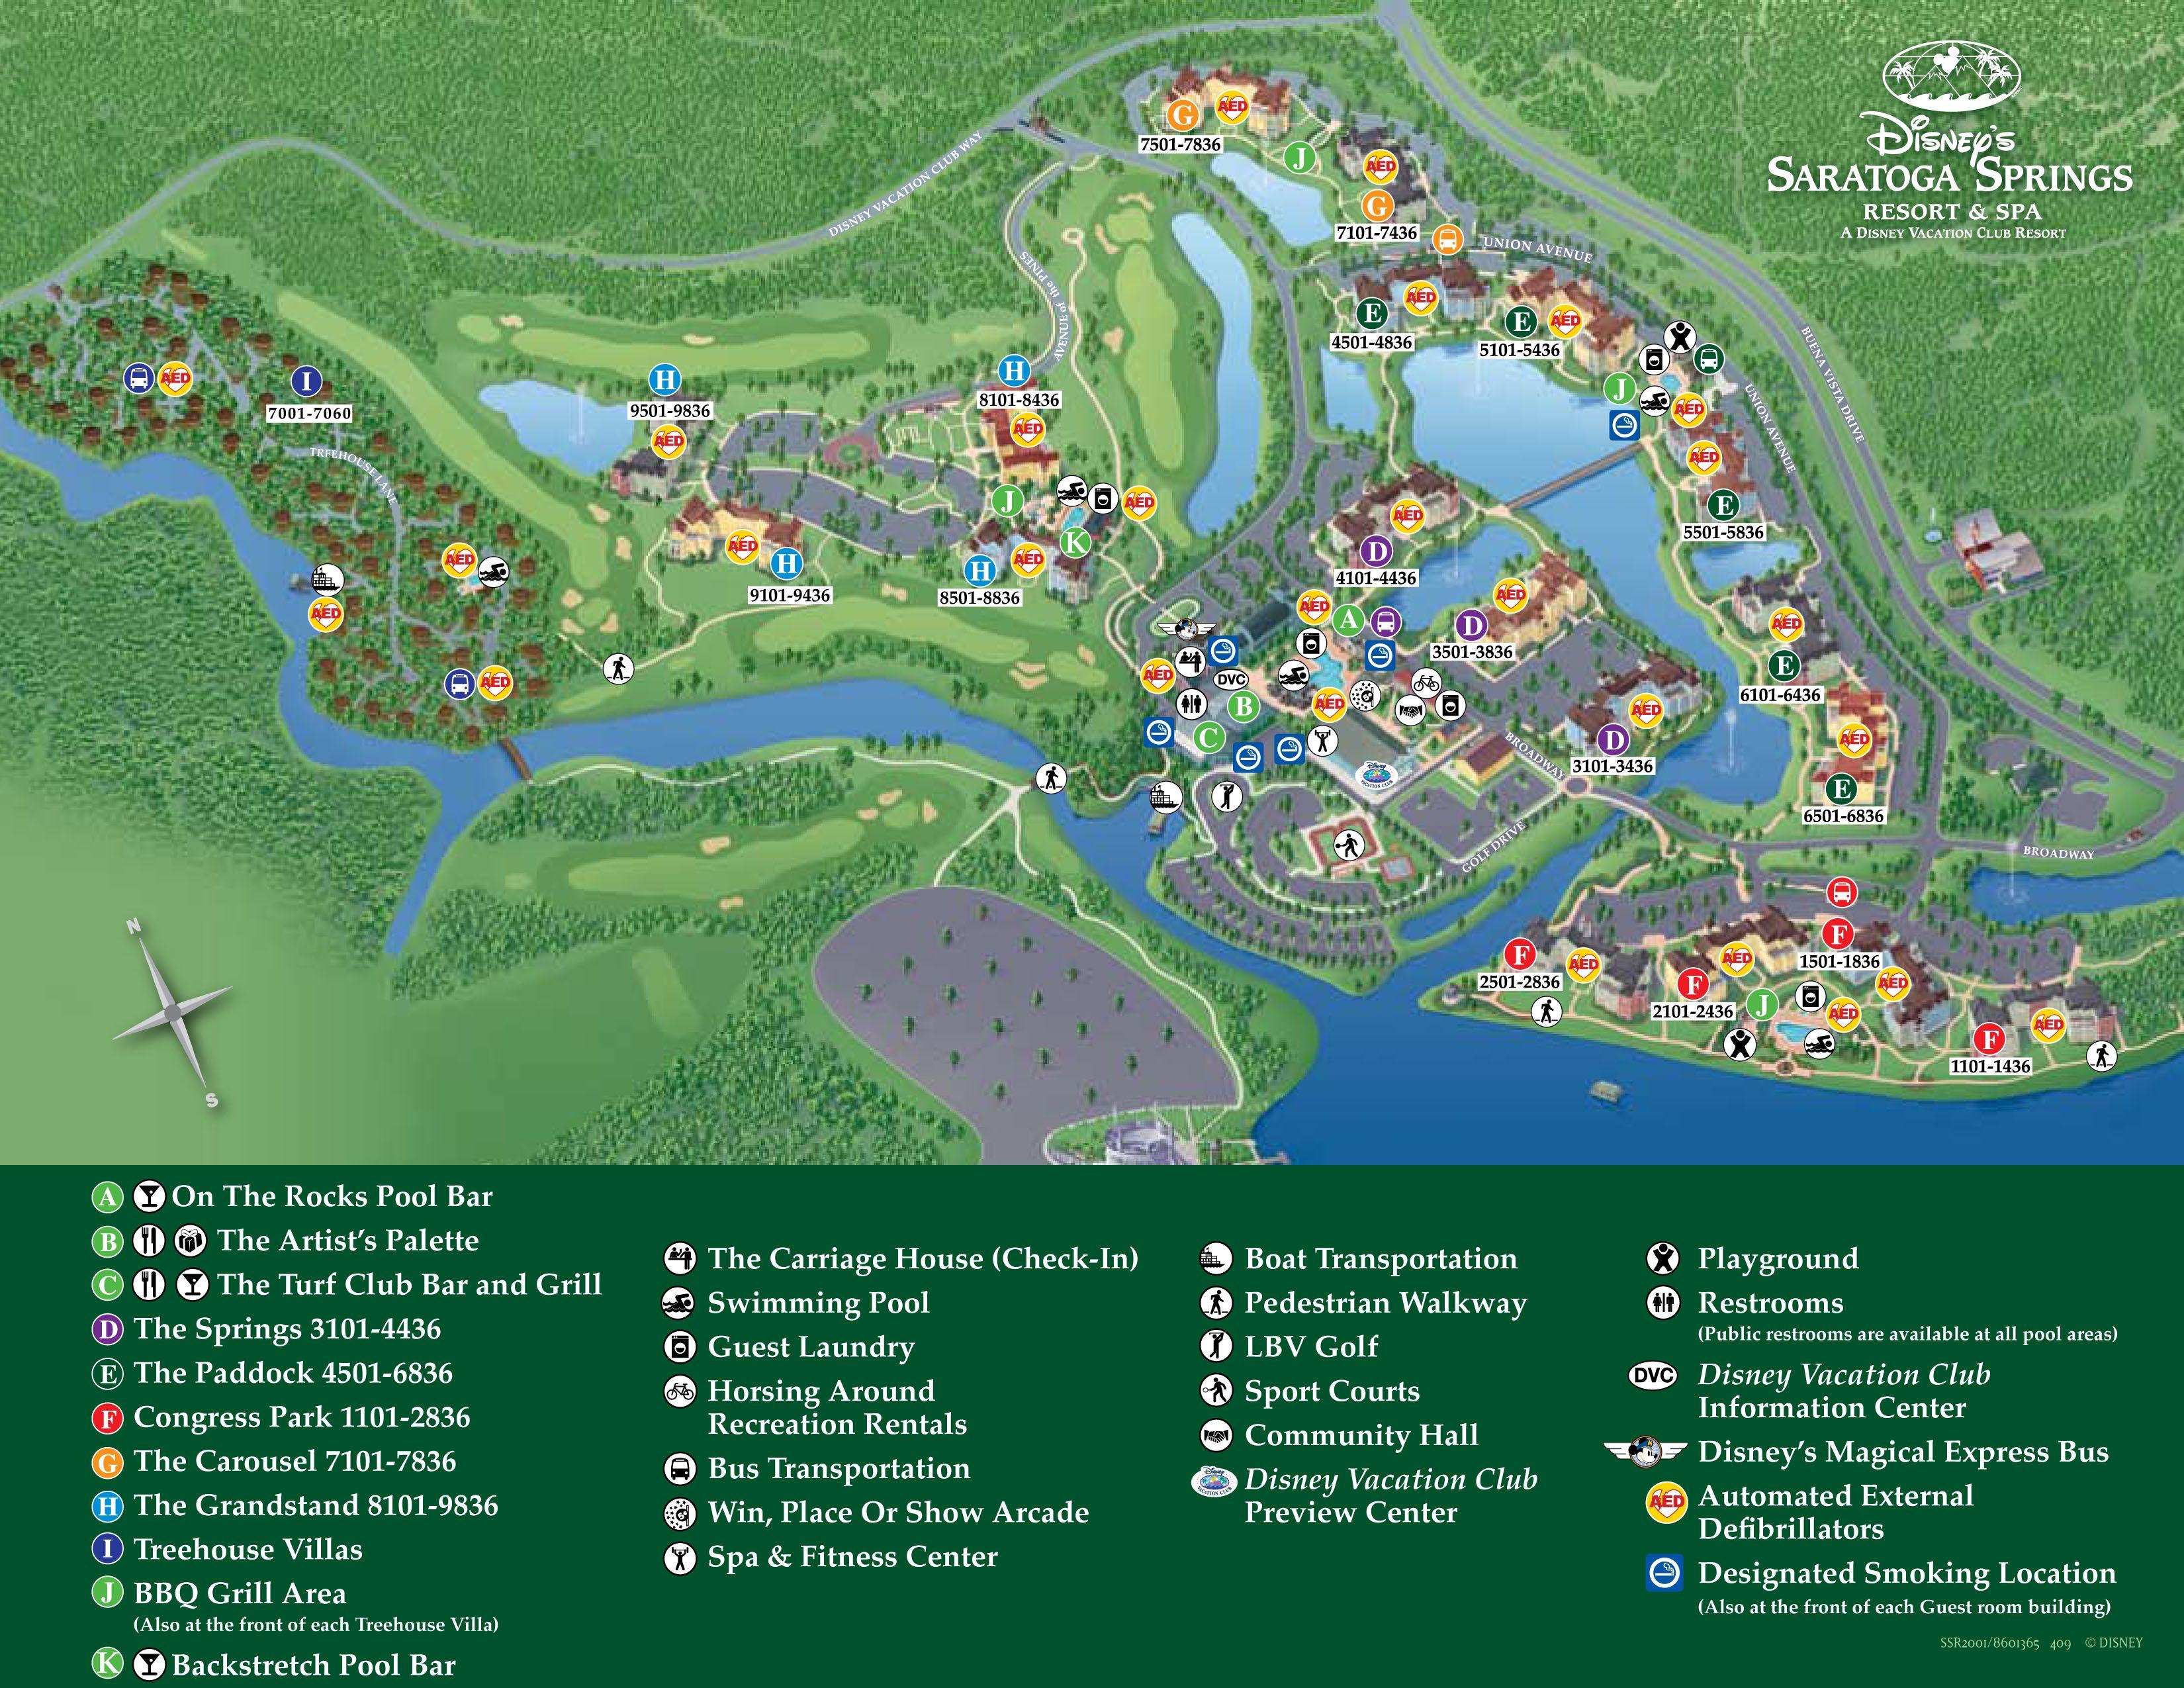 Saratoga Springs Resort Map Walt Disney World  Disney World Maps